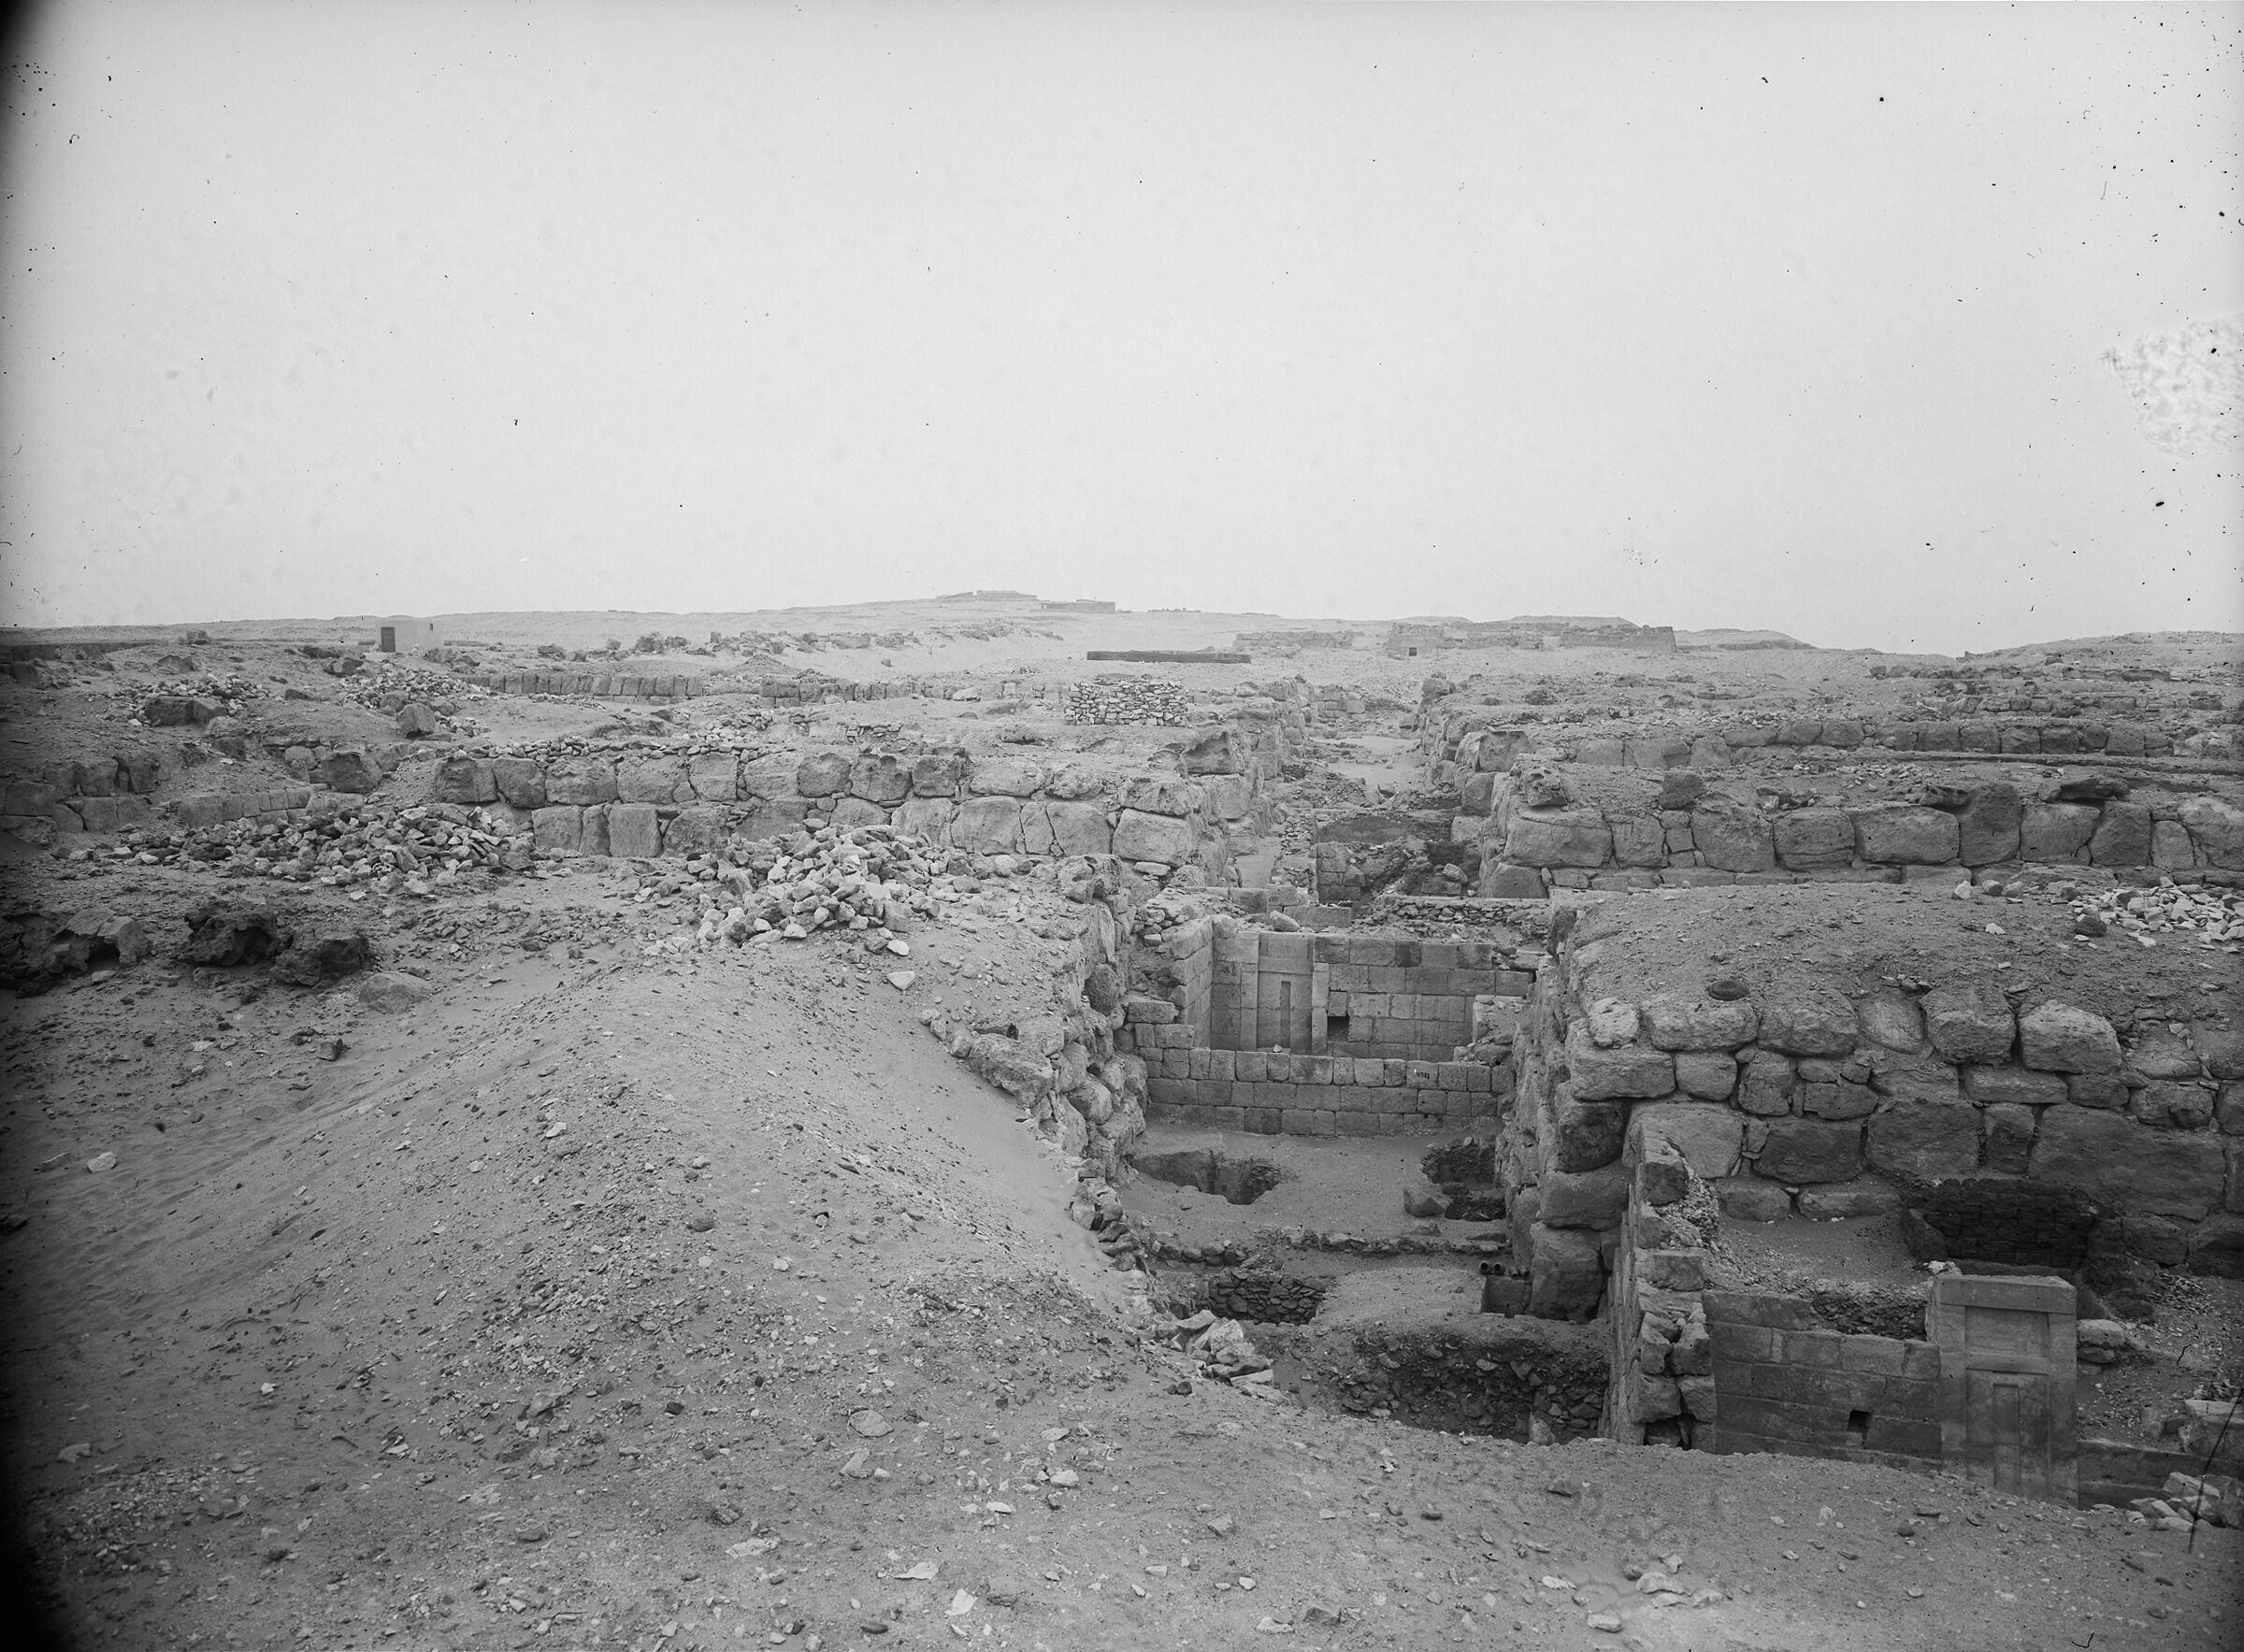 Western Cemetery: Site: Giza; View: G 4820, G 4830, G 4733, G 4833, G 4821, G 4822